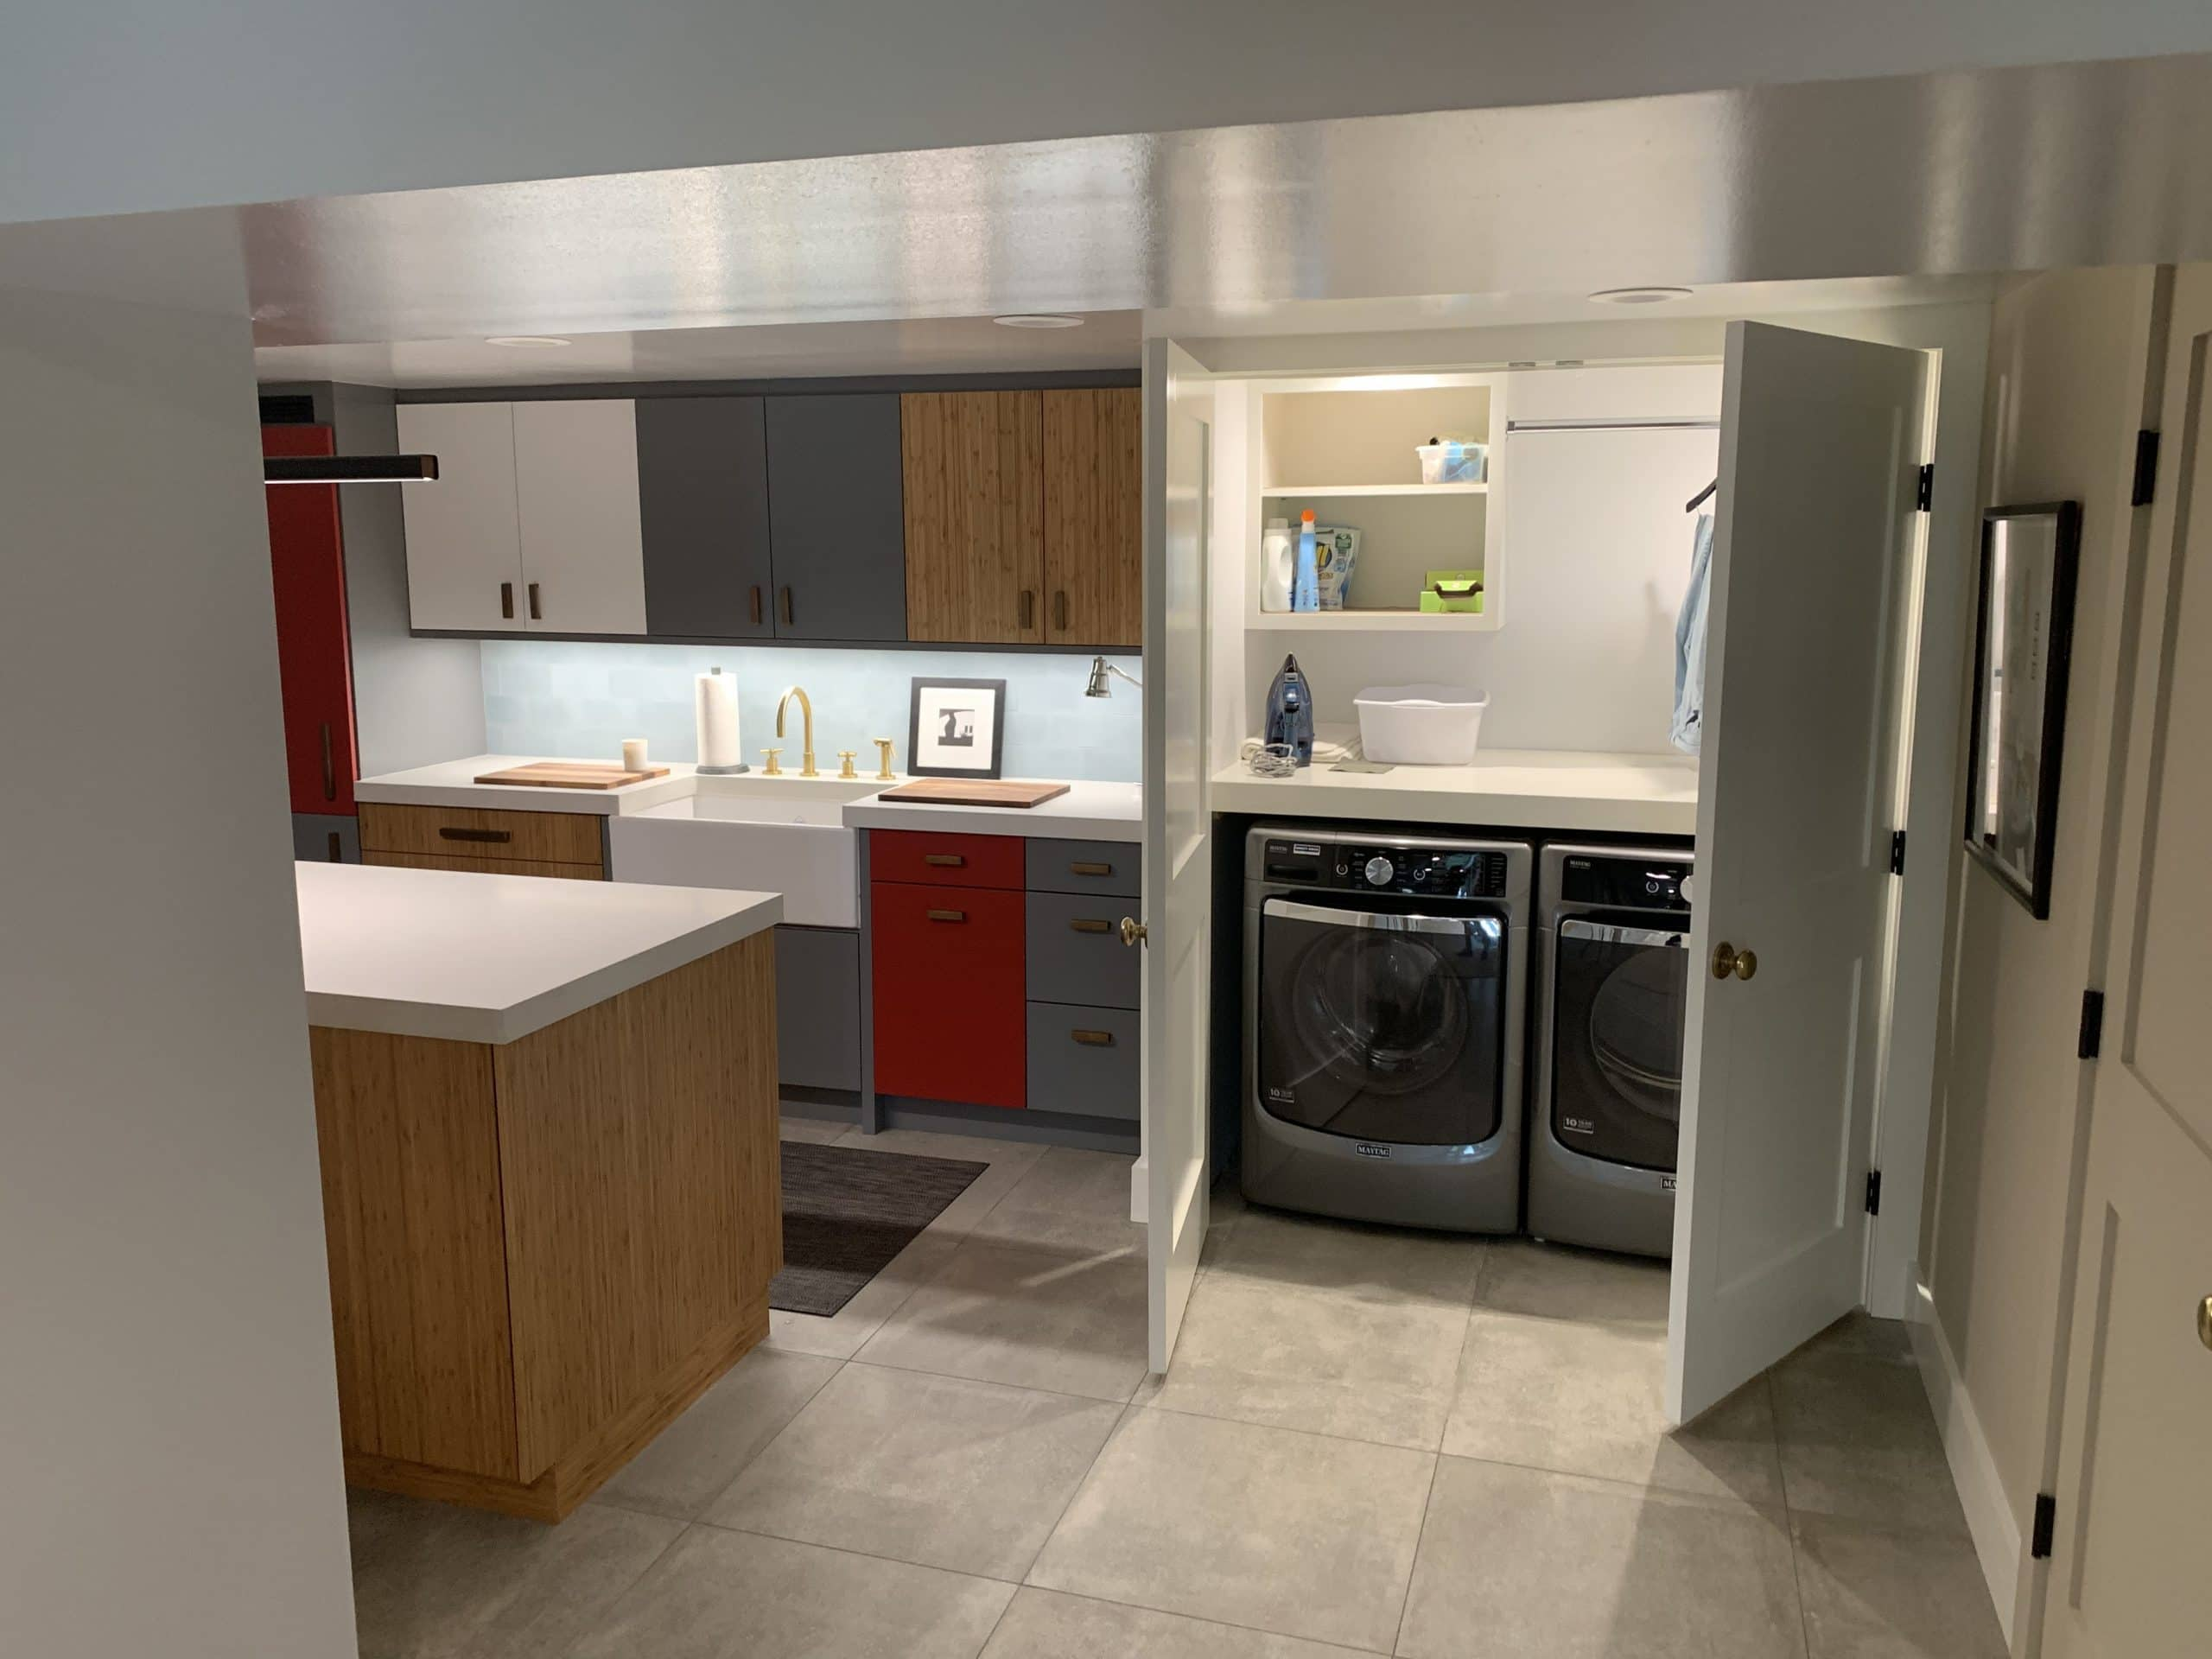 Basement Kitchen Remodel